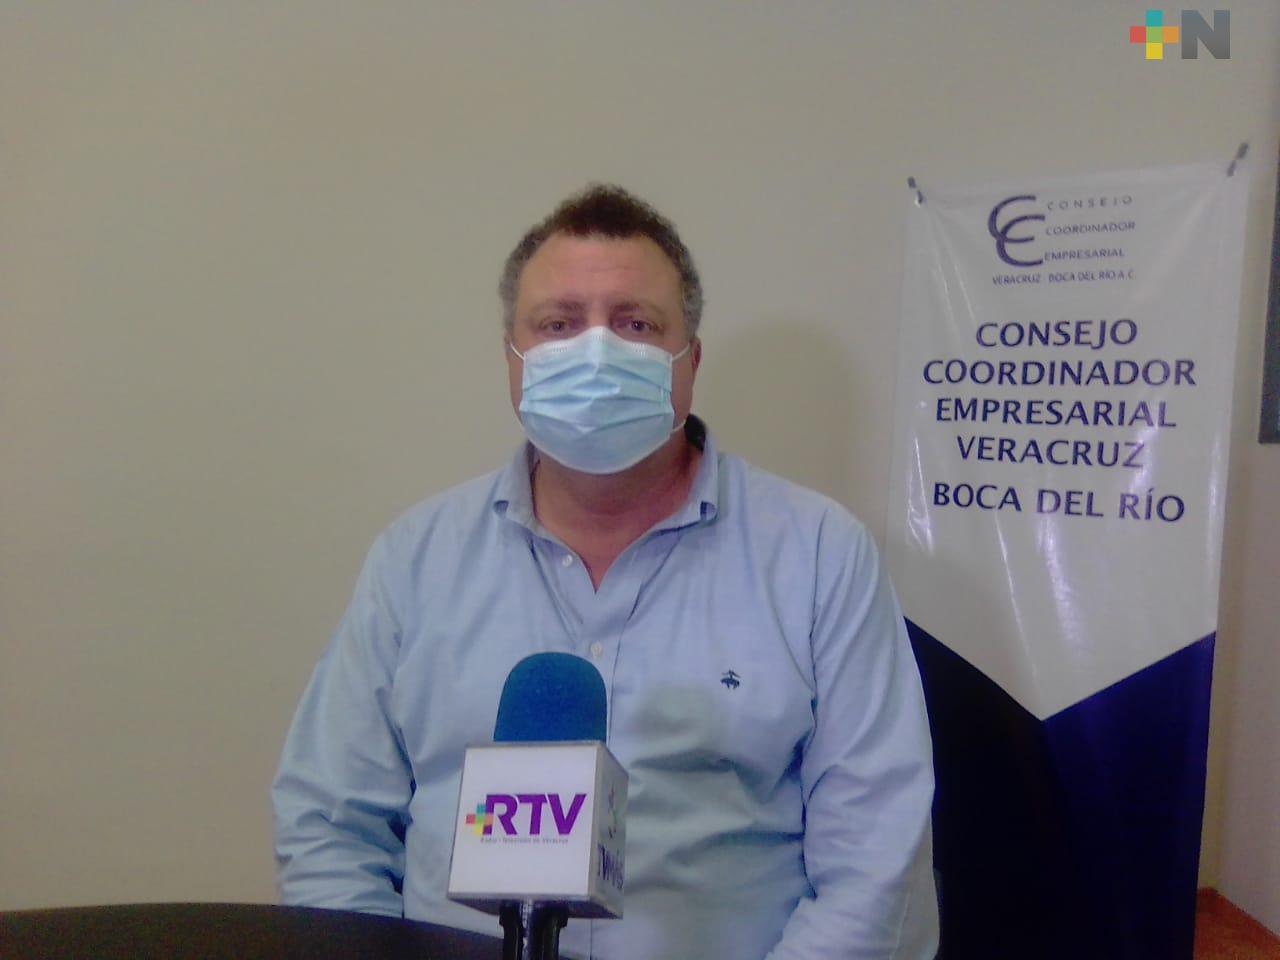 Canacar espera se pueda controlar pandemia del COVID-19 en seis meses máximo